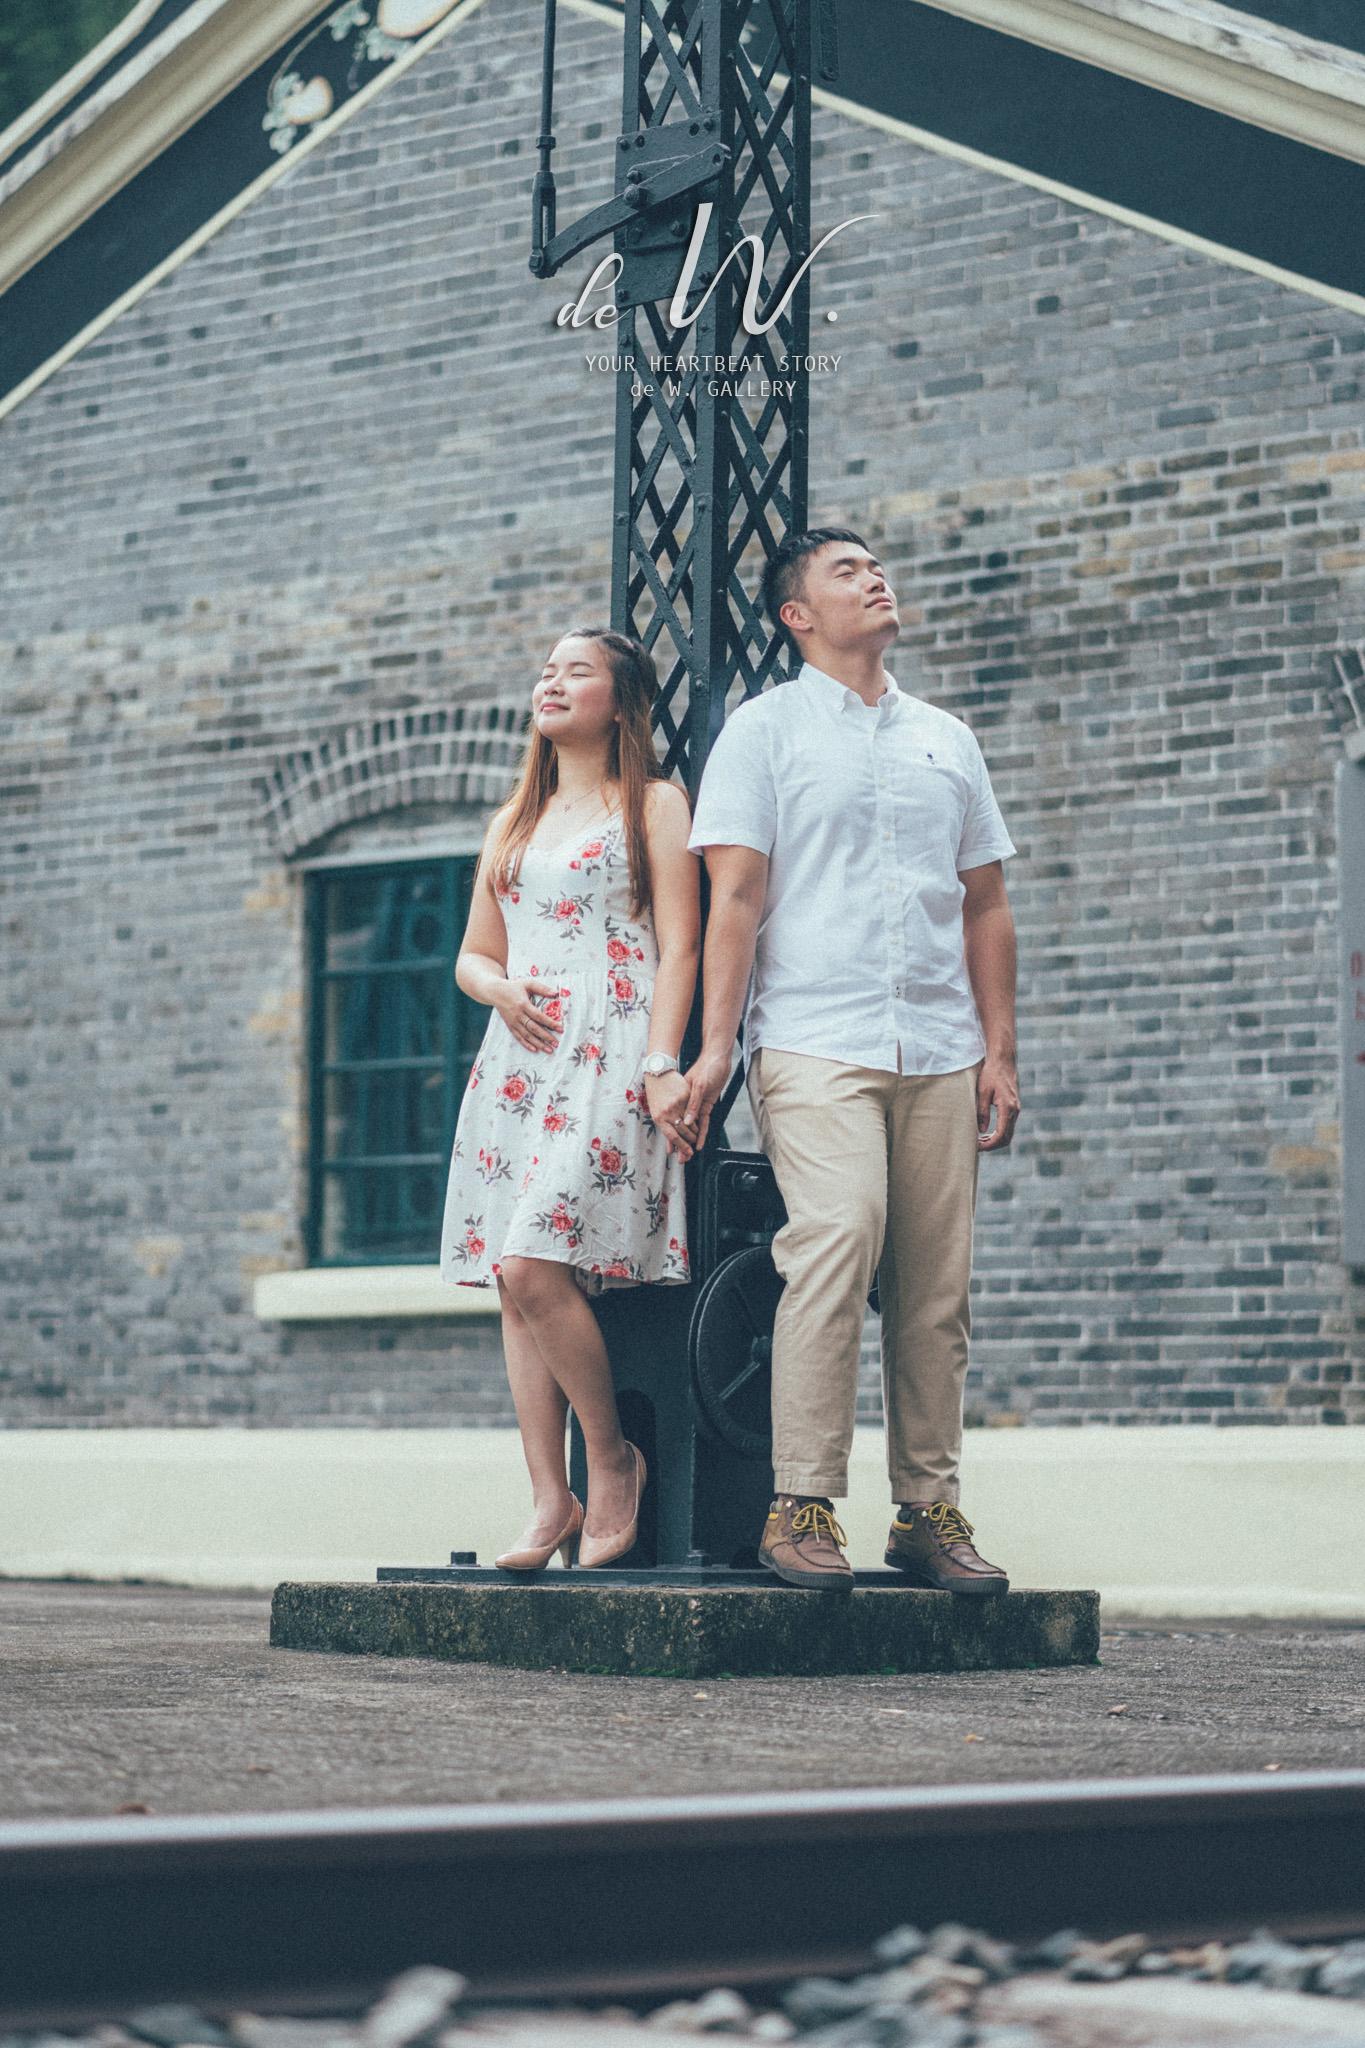 film style story teller de w gallery top10 destination wedding 大埔 火車 2048-035